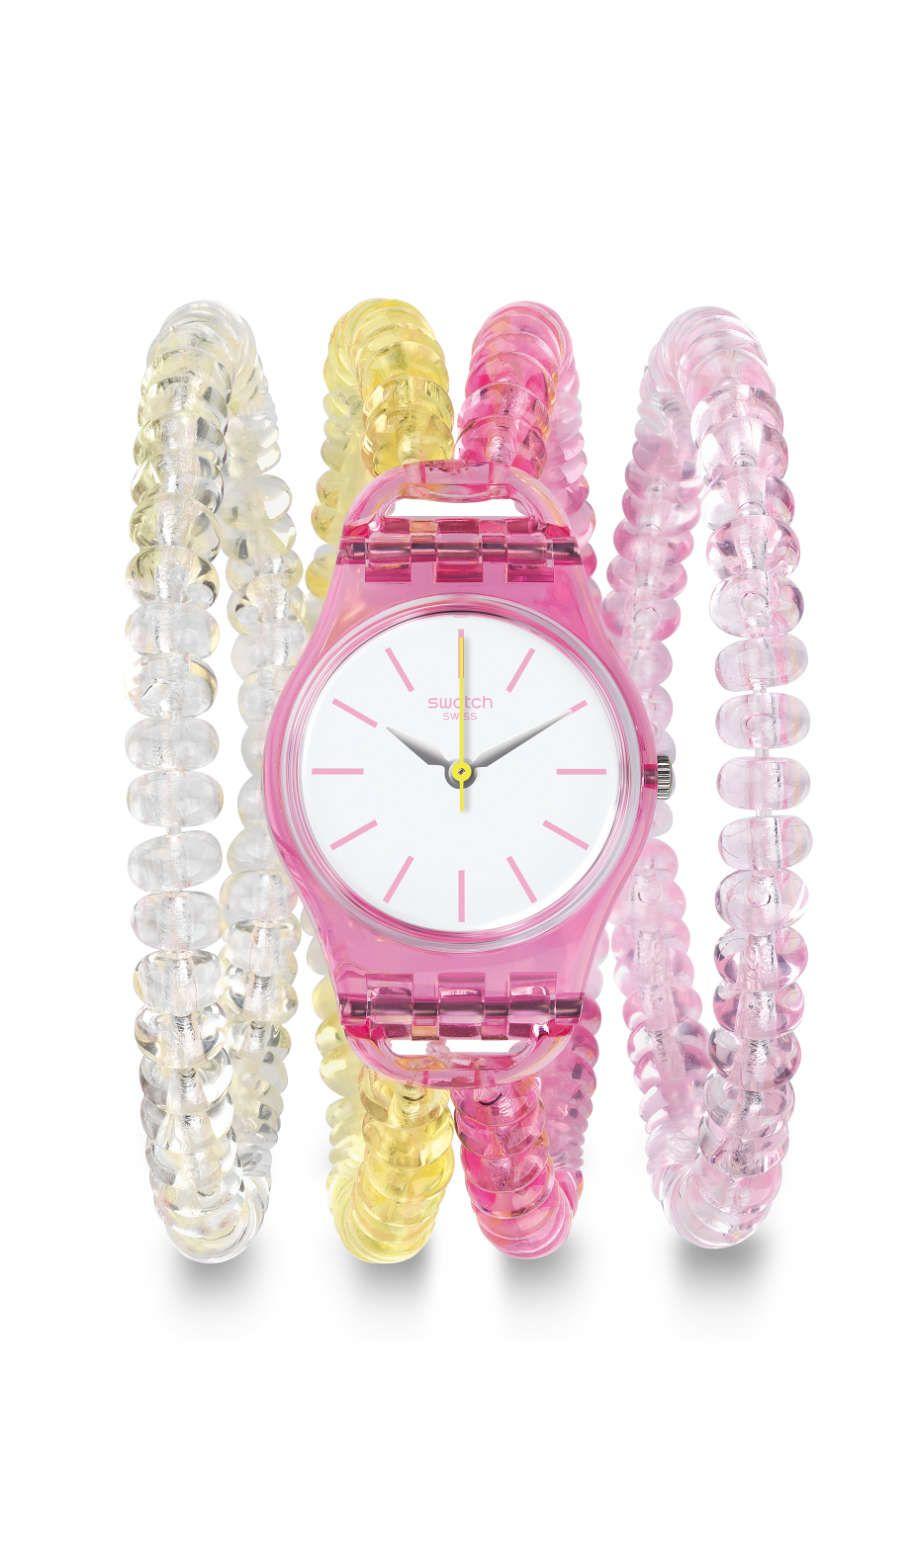 DayPrerelease Woman's En Watches Sunny Relojes Mujer Pre De ~ 6yvYgbfI7